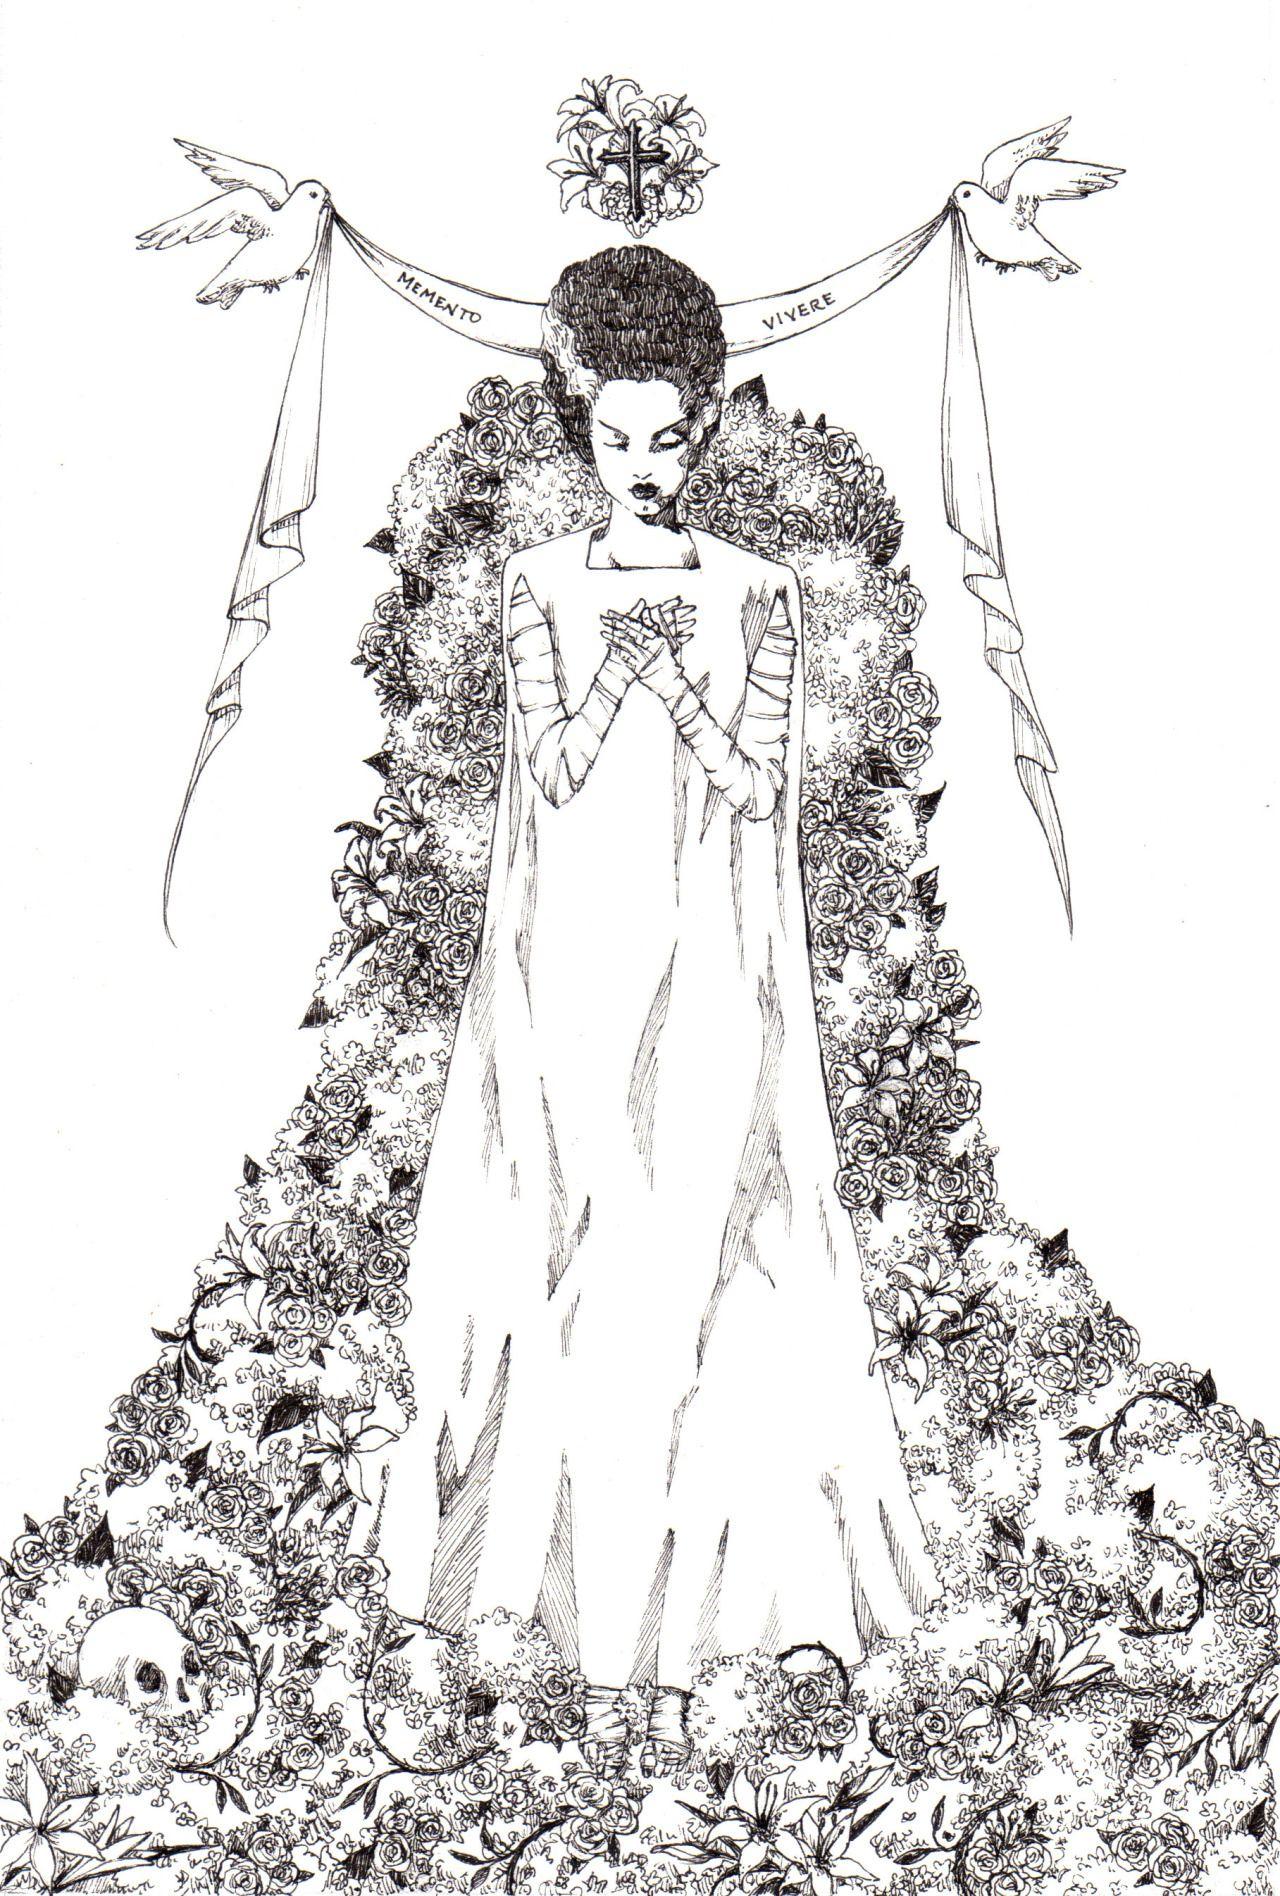 Memento Vivere - The Bride at Hyaena Gallery - katphilbin